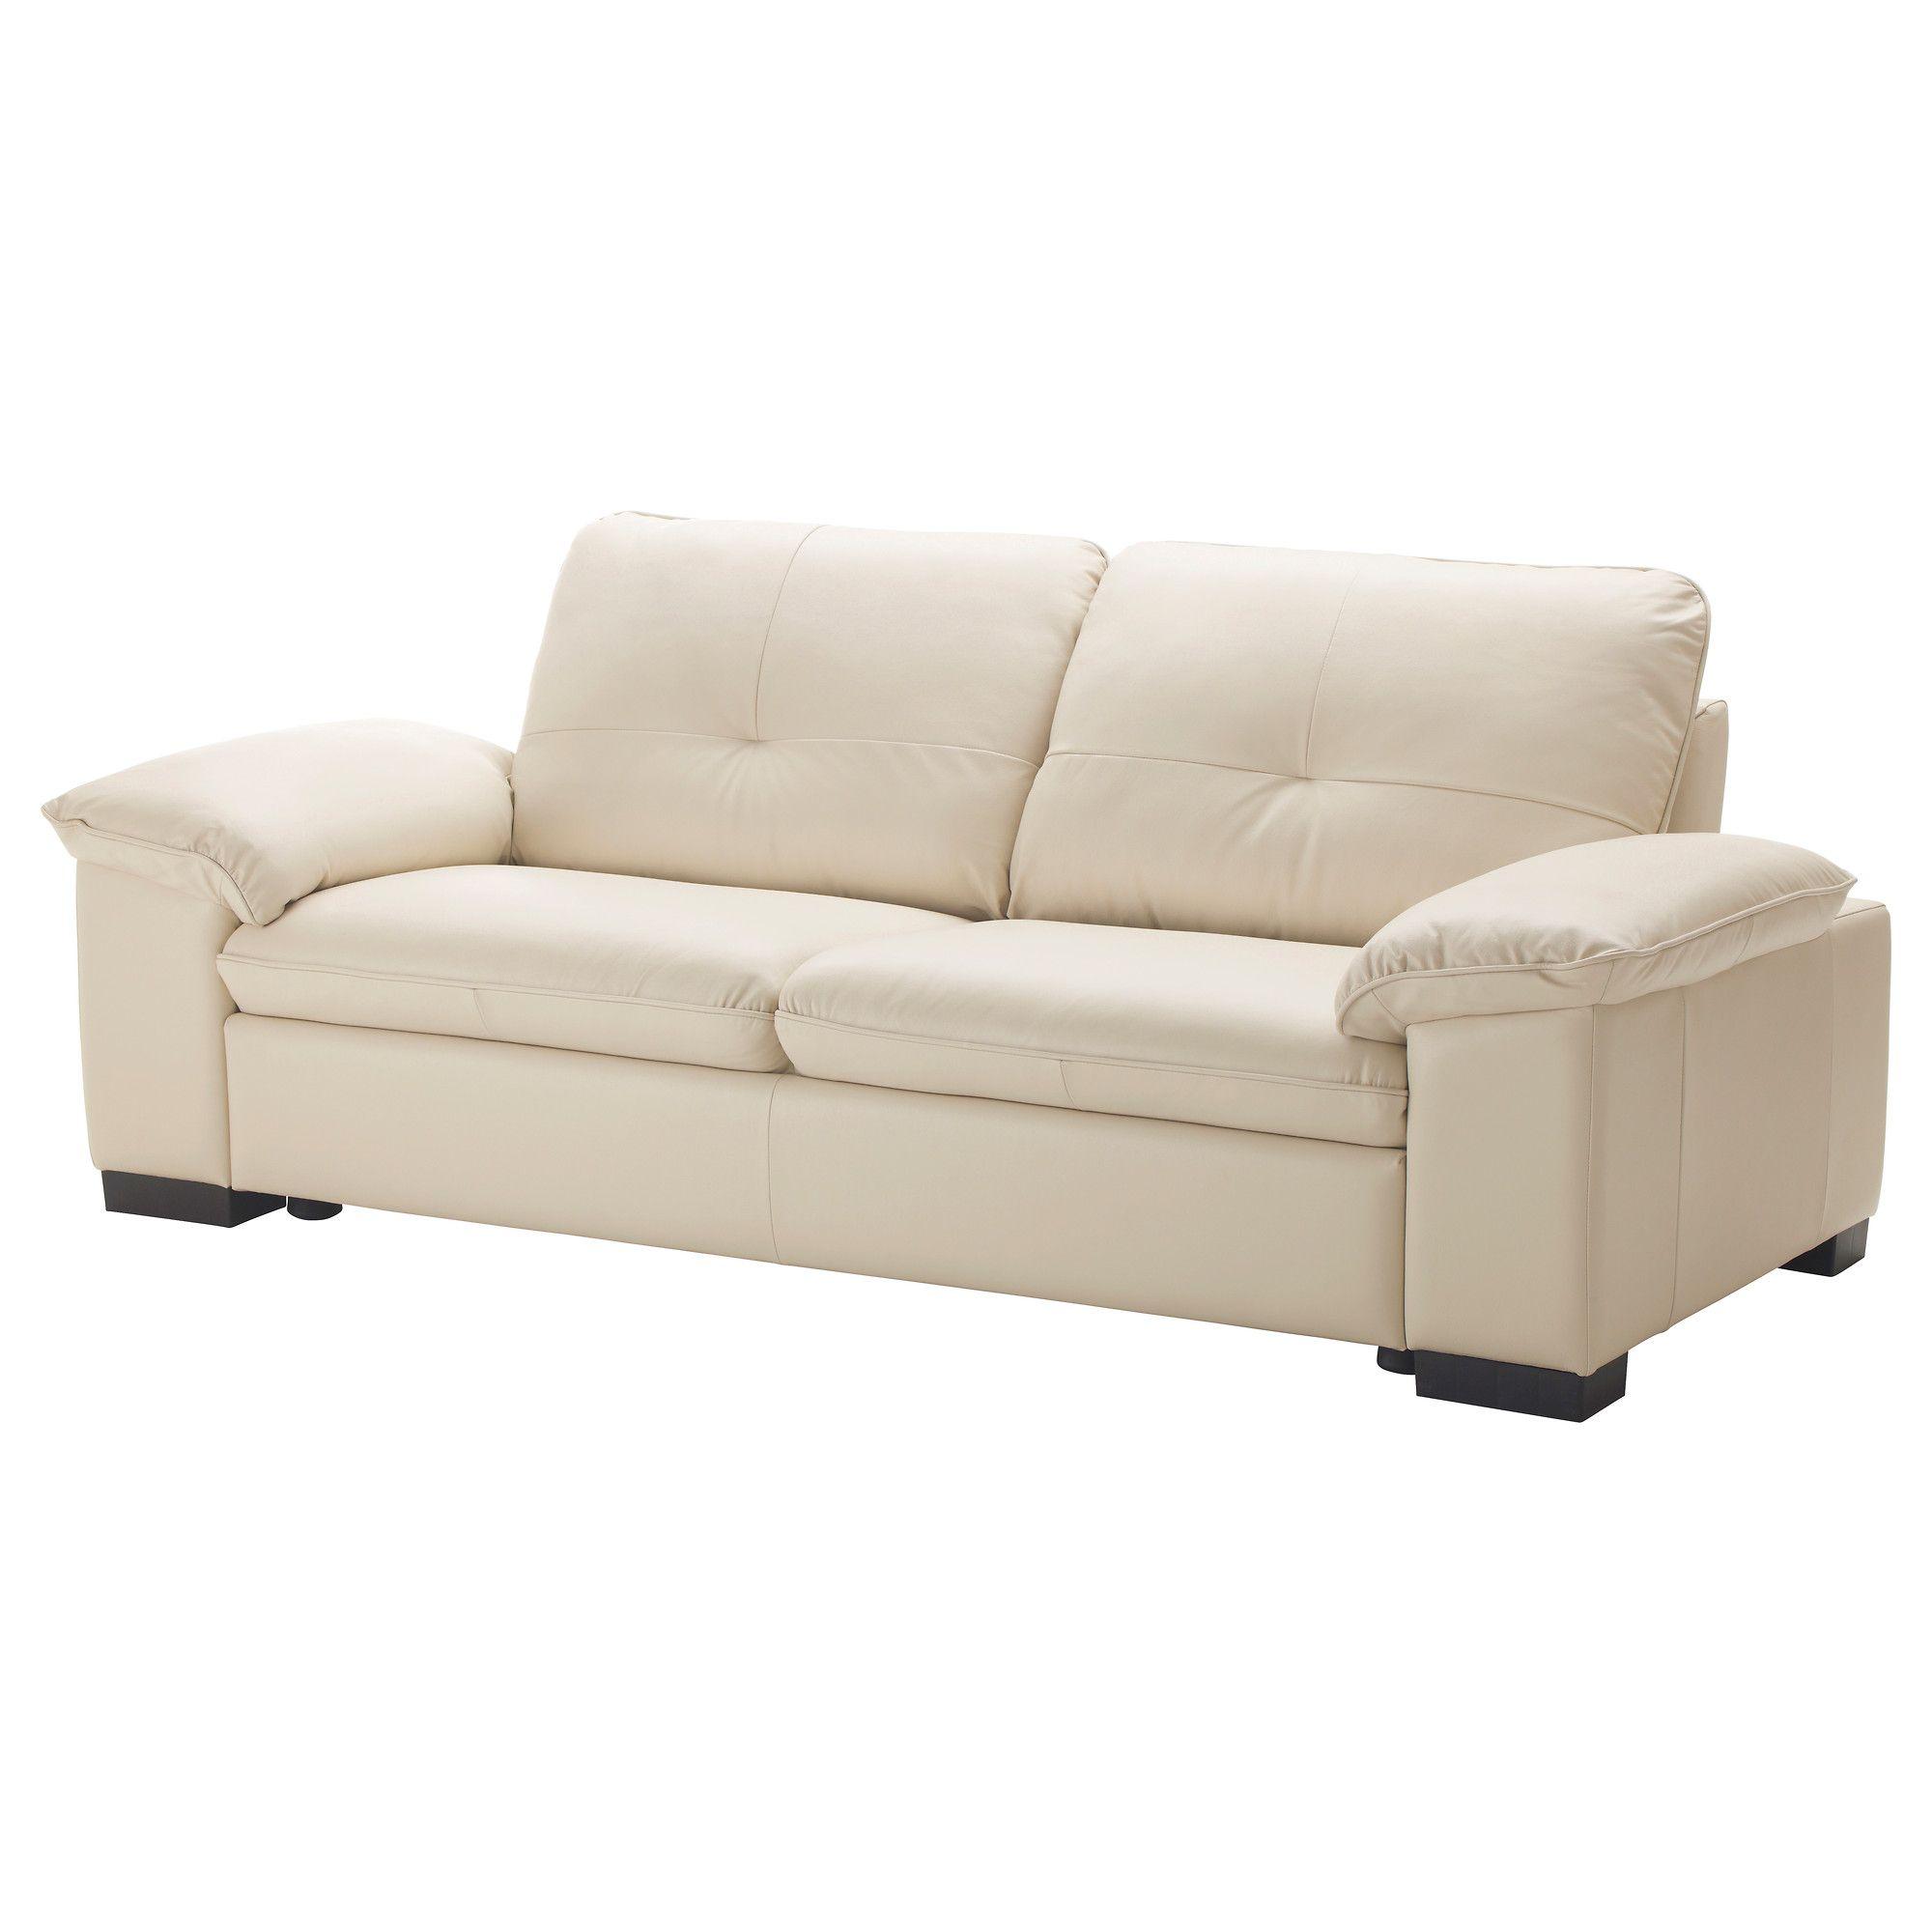 Ikea Us Furniture And Home Furnishings